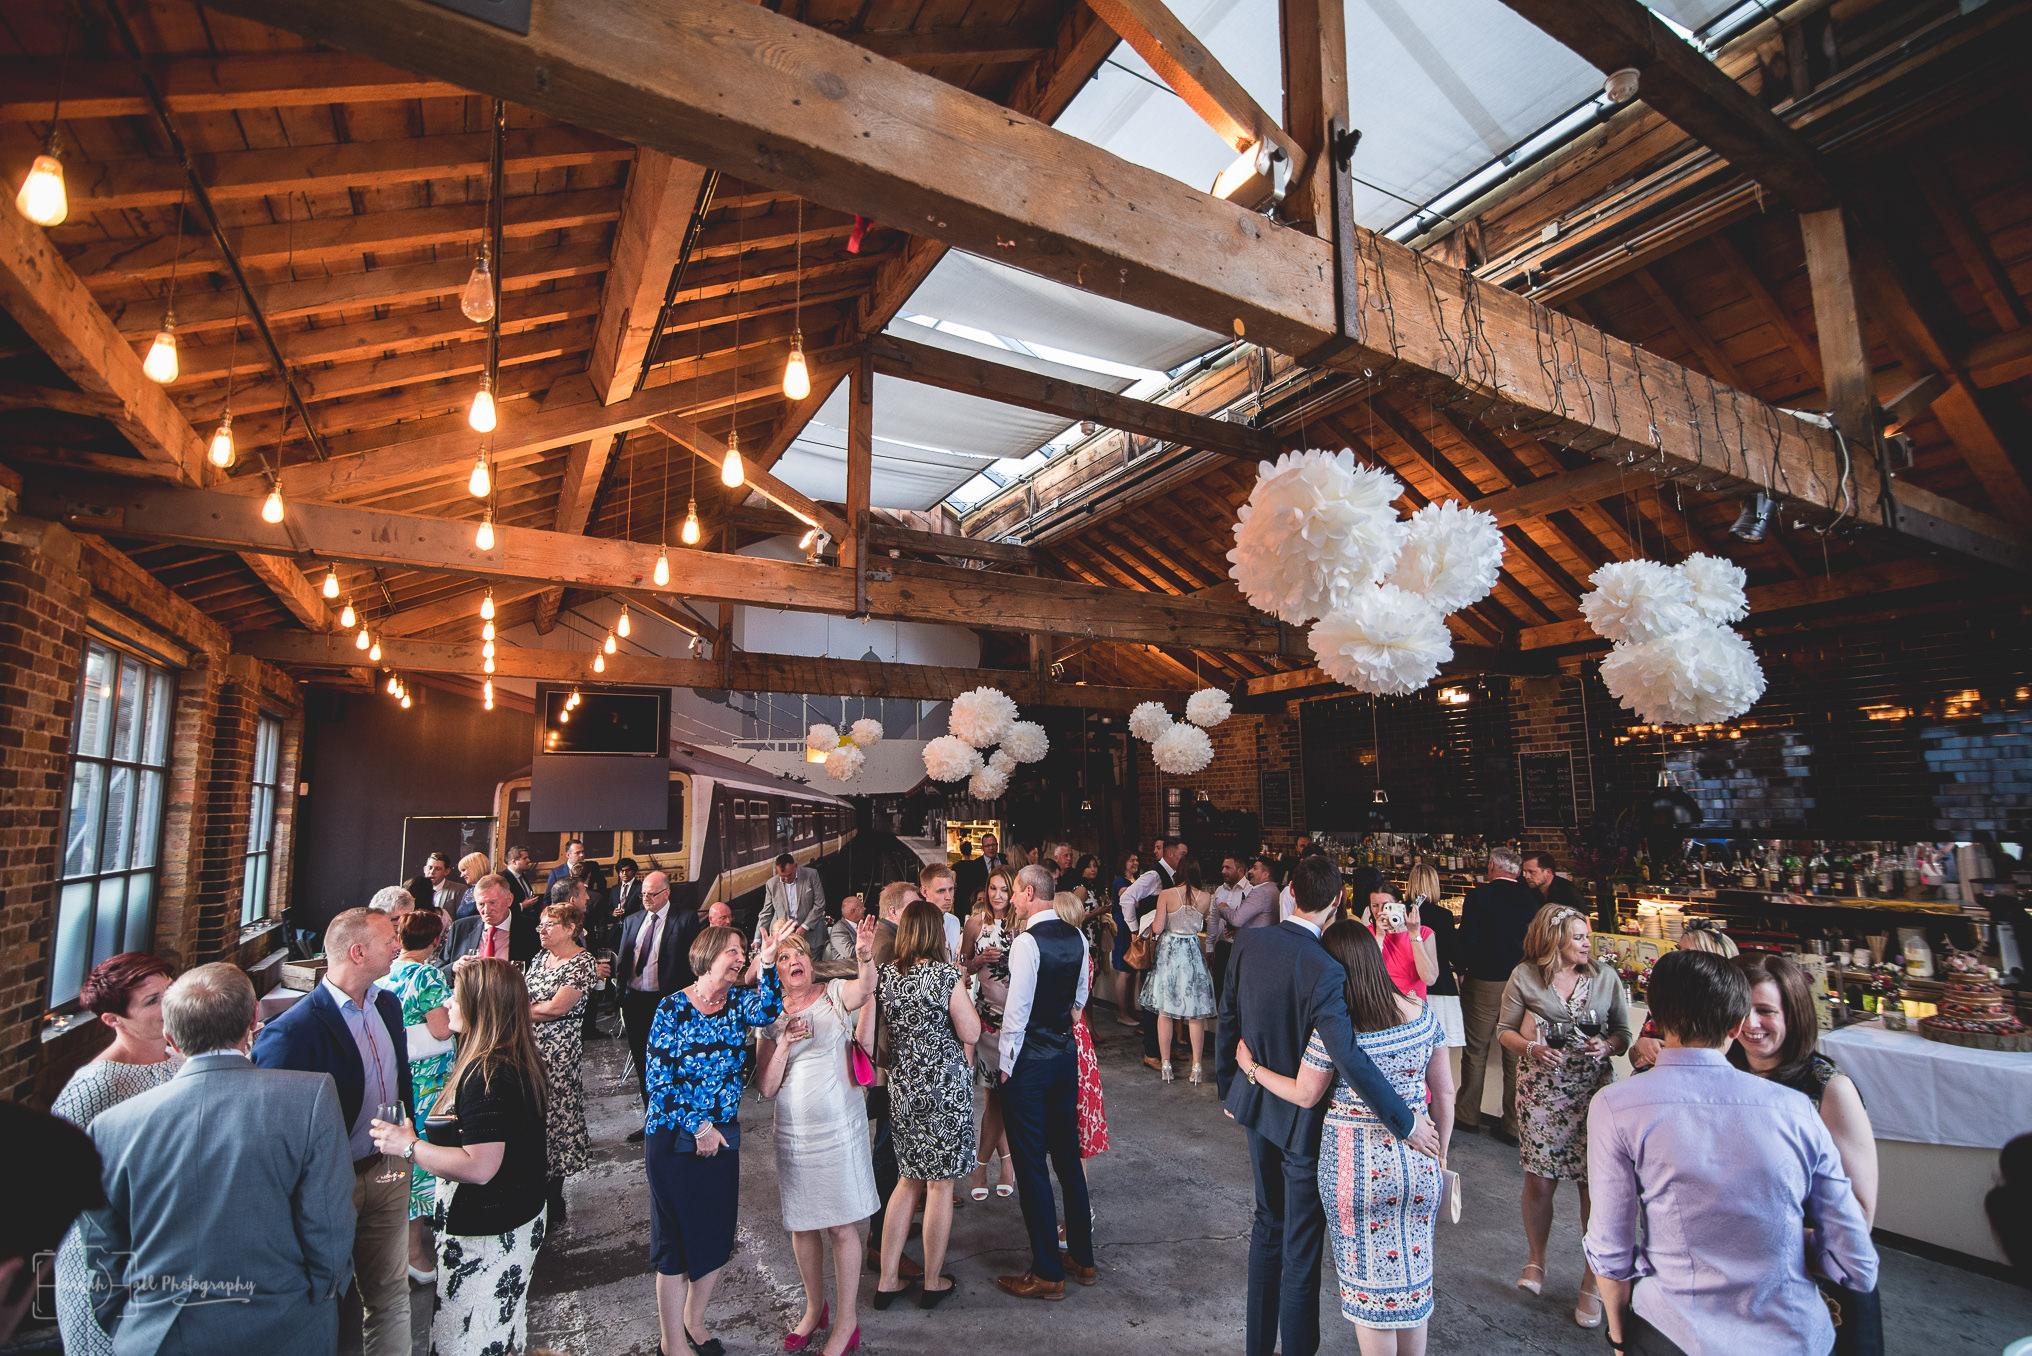 HHP-6-st-chads-place-wedding-103